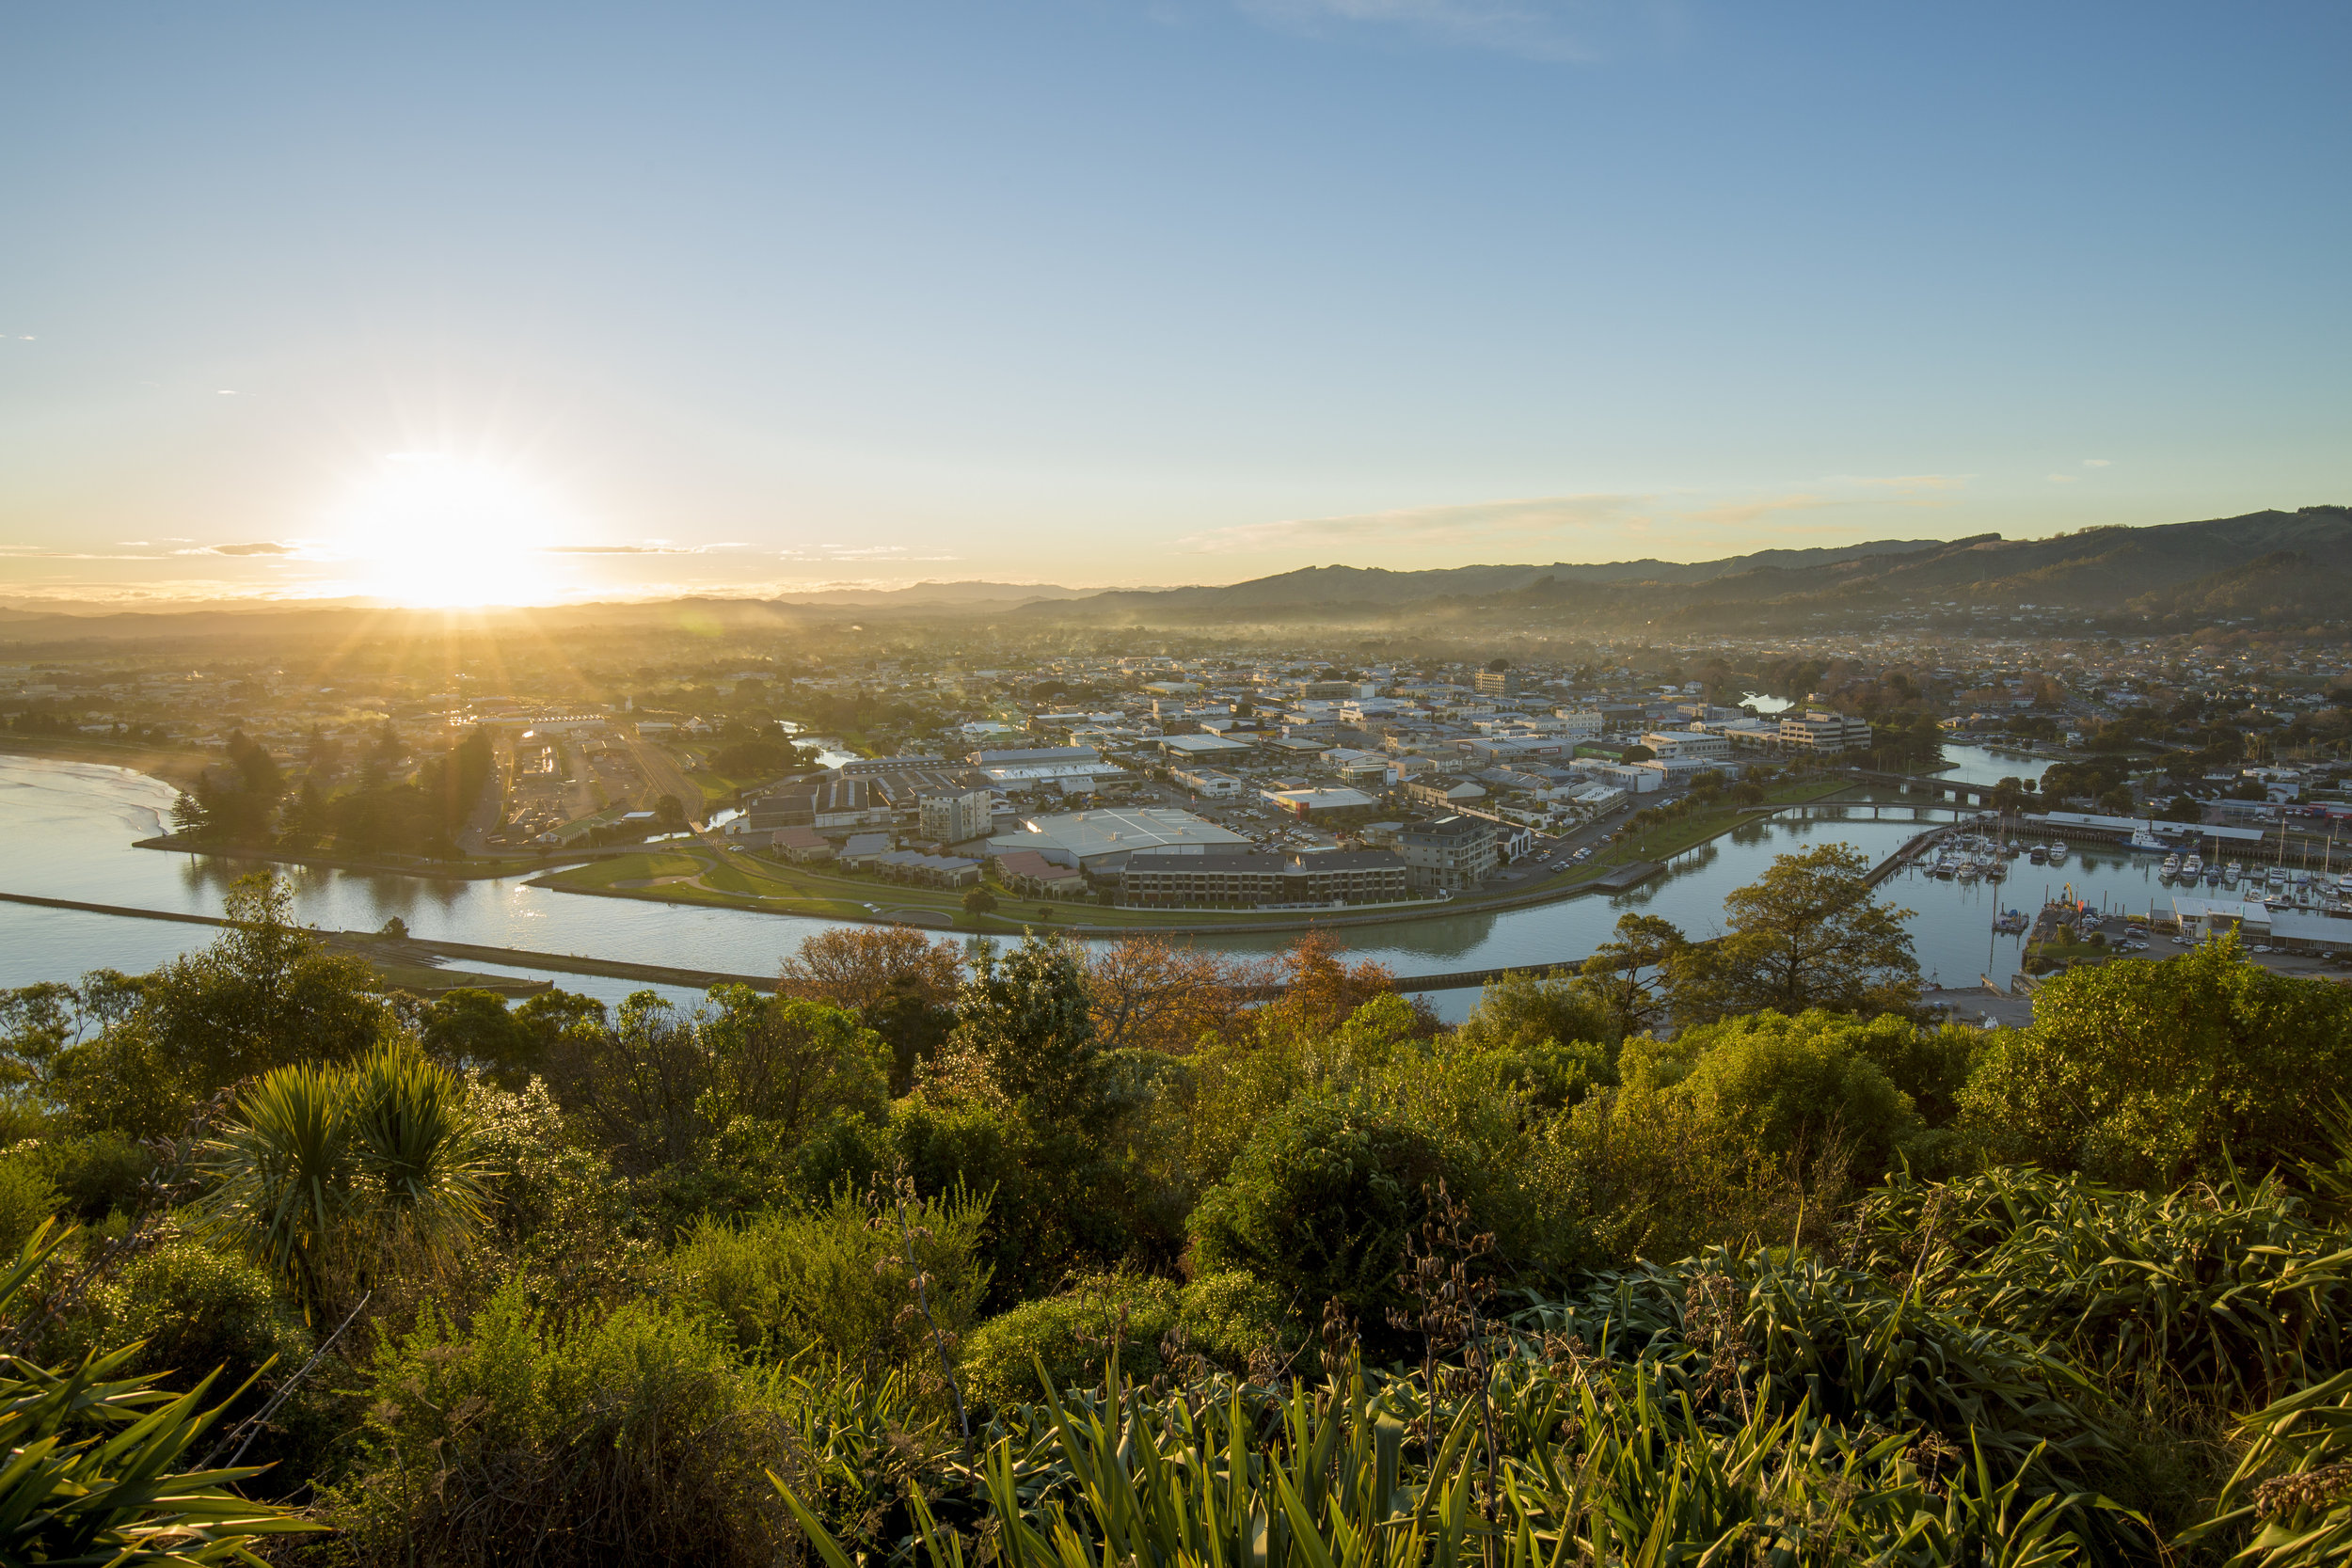 Kaiti Hill has some stunning views of Gisborne